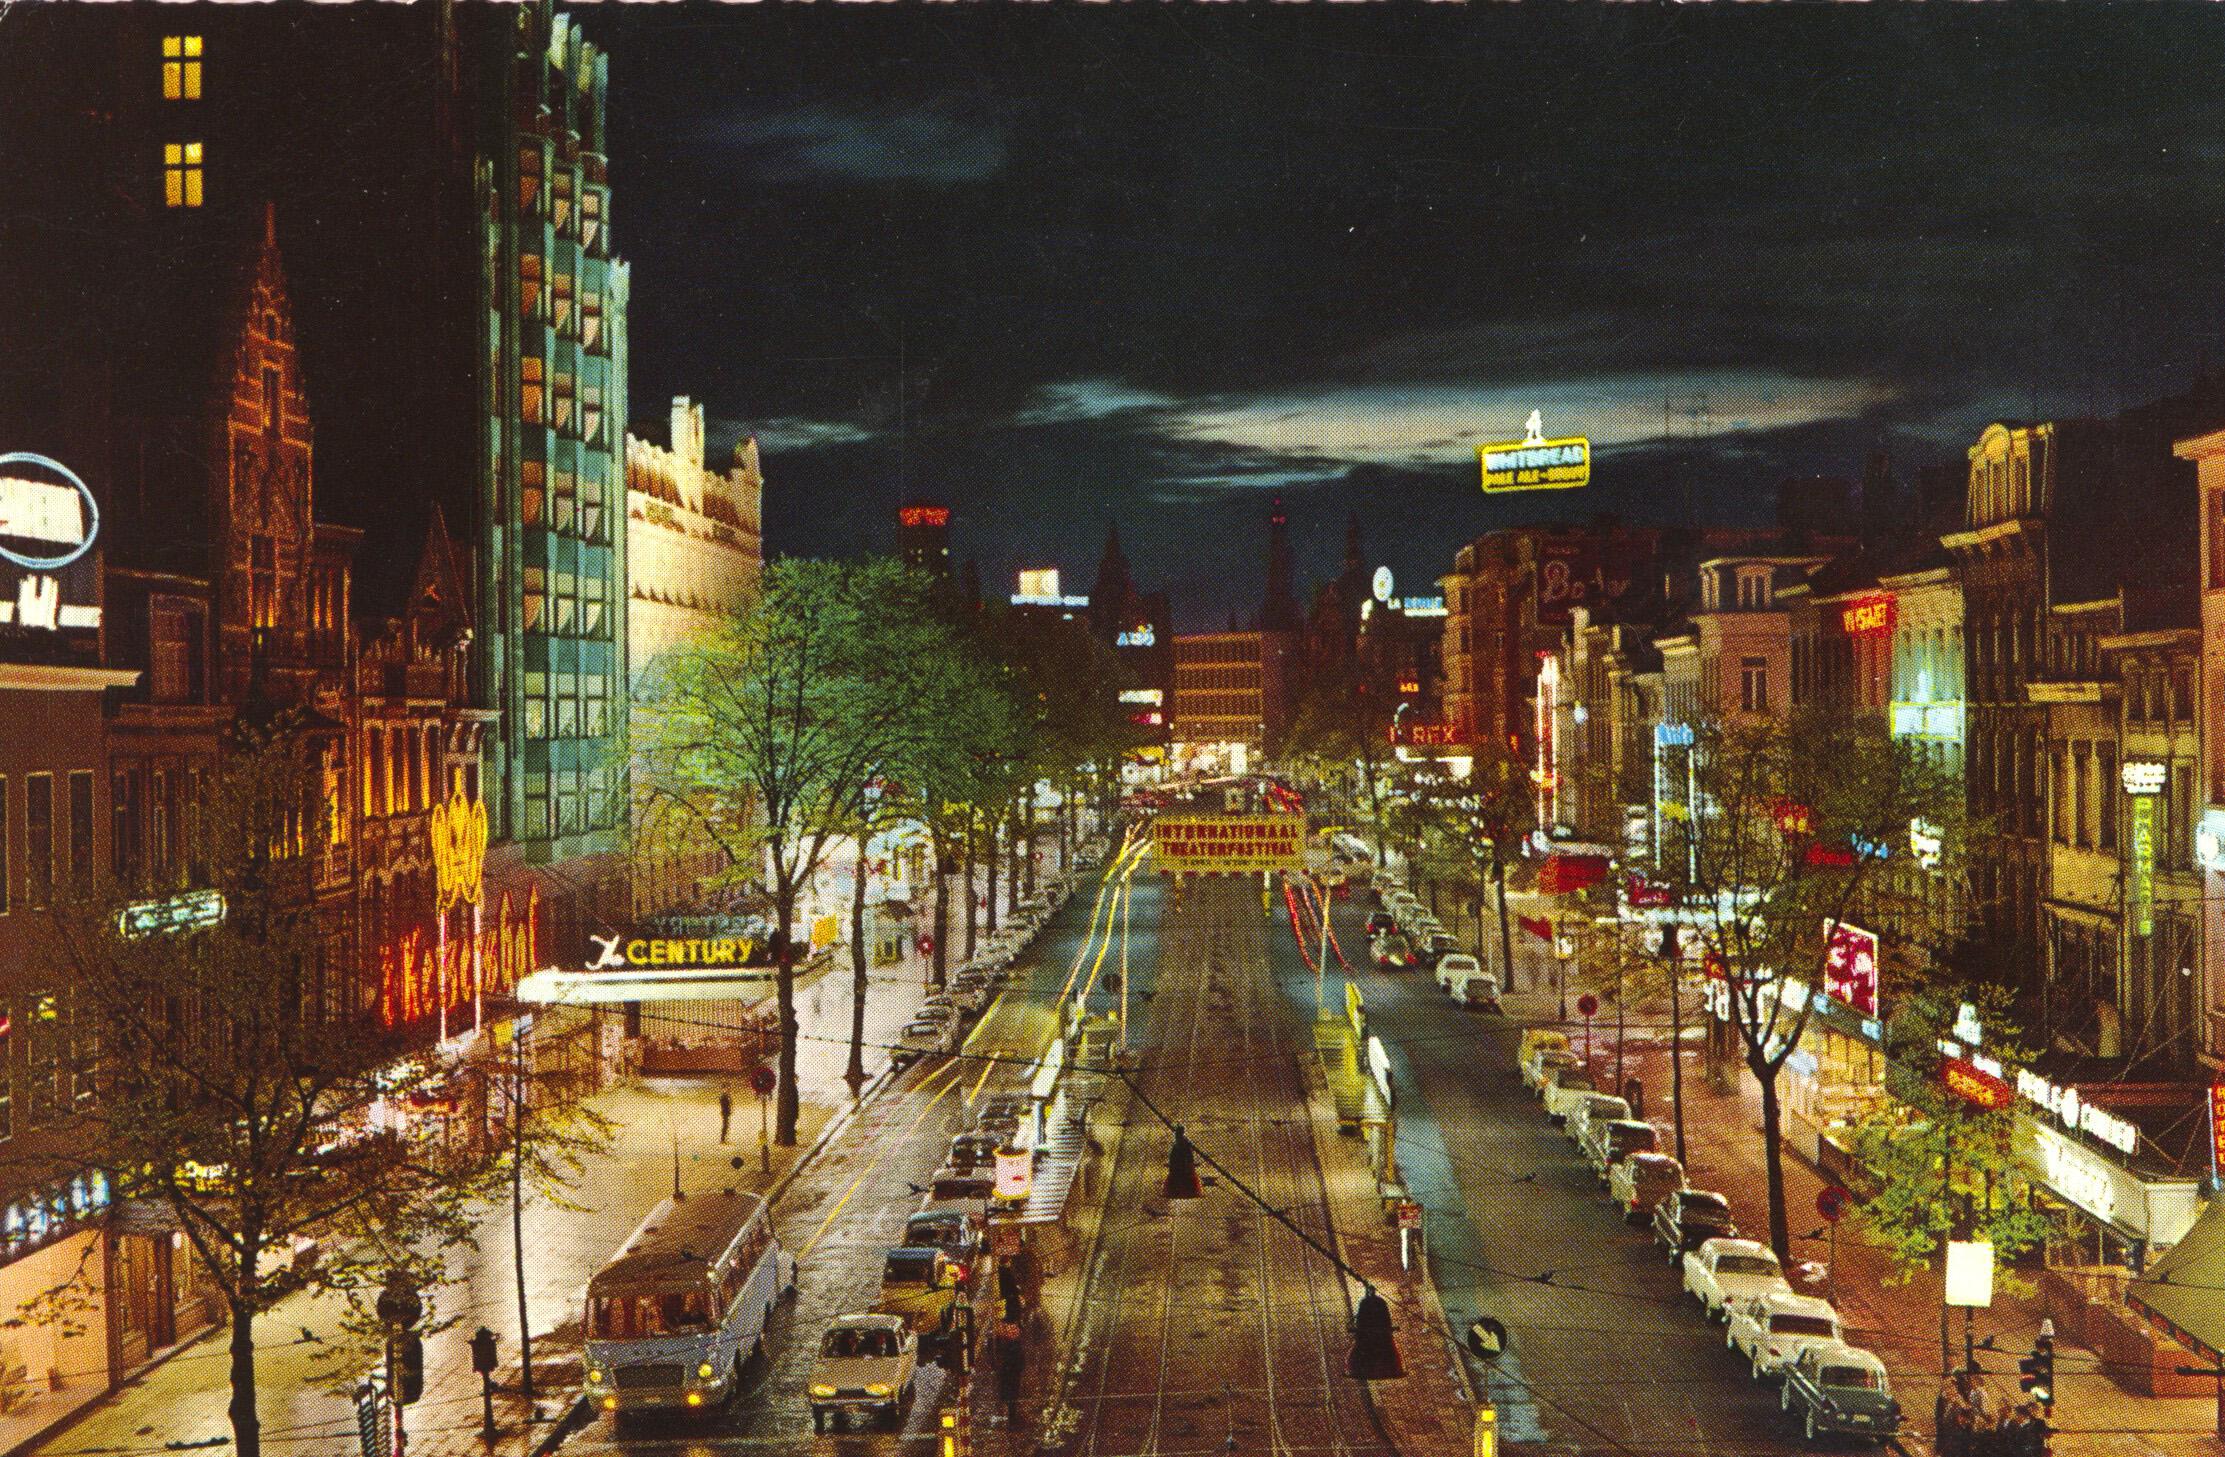 1966 approx postcard, Antwerp de Keiserlei